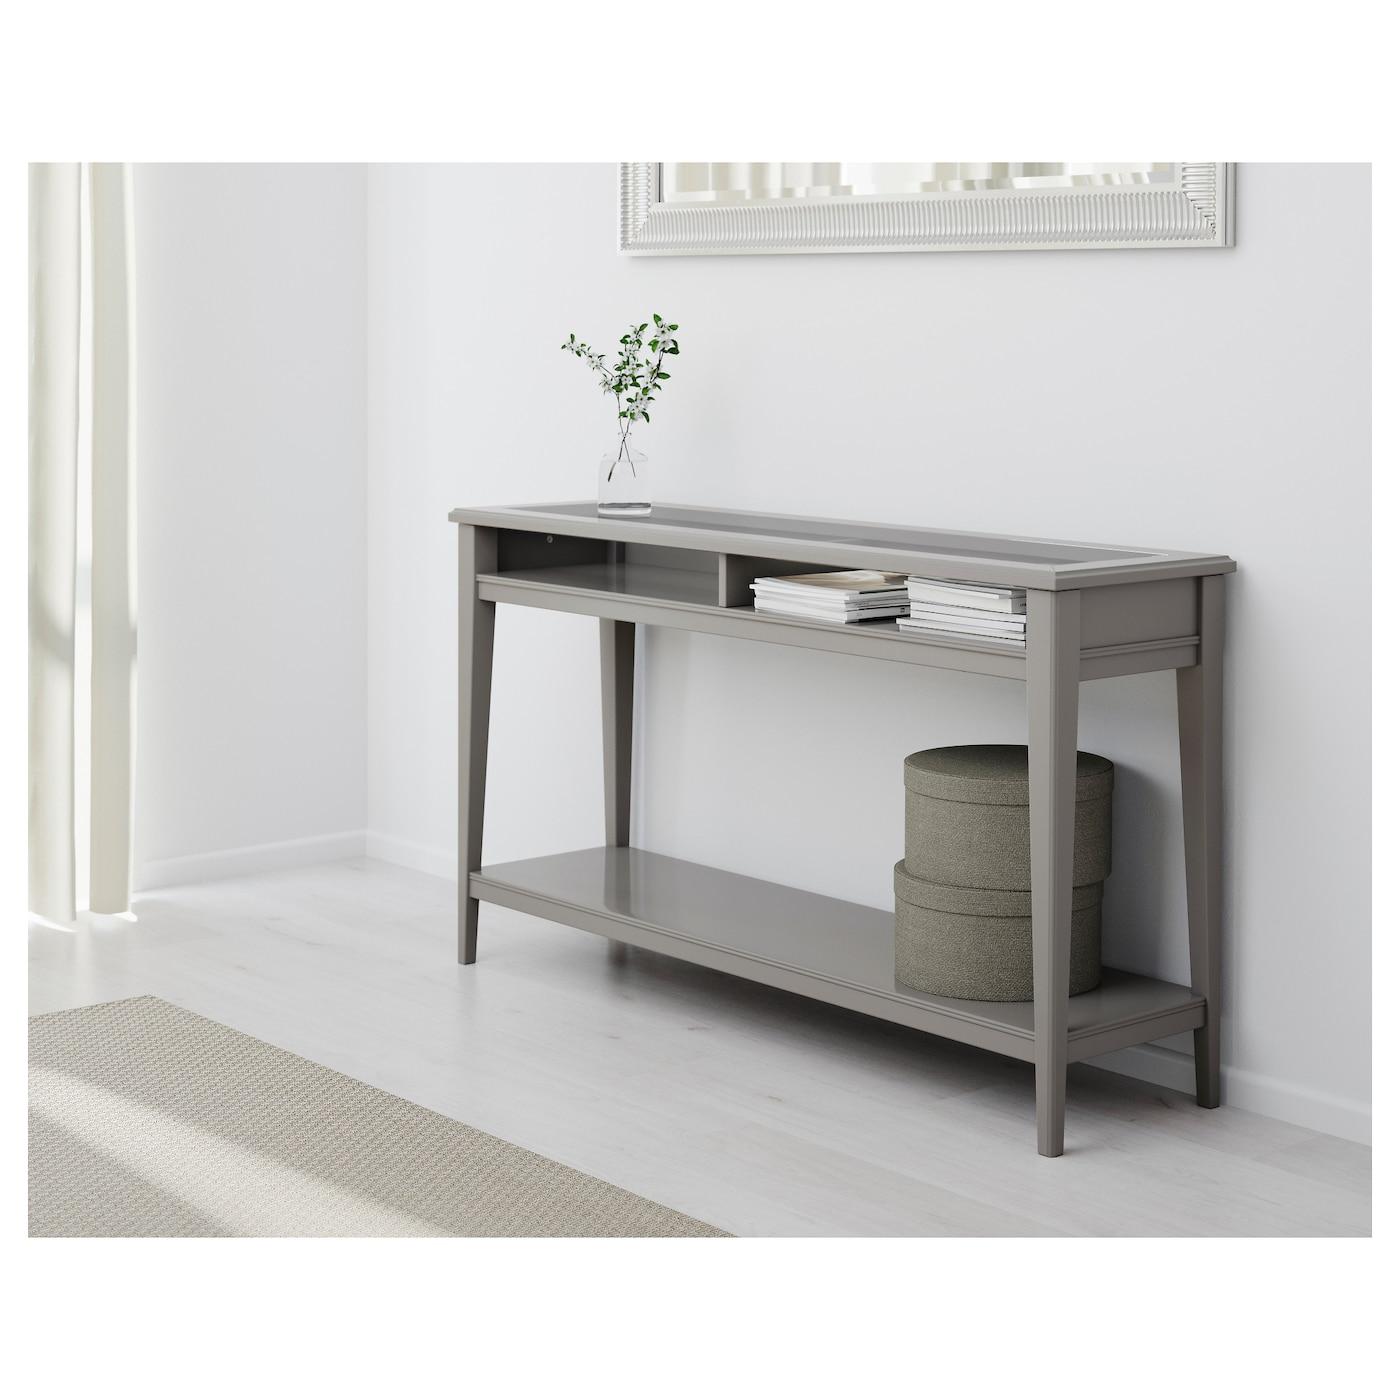 LIATORP Console table Grey glass 133×37 cm IKEA